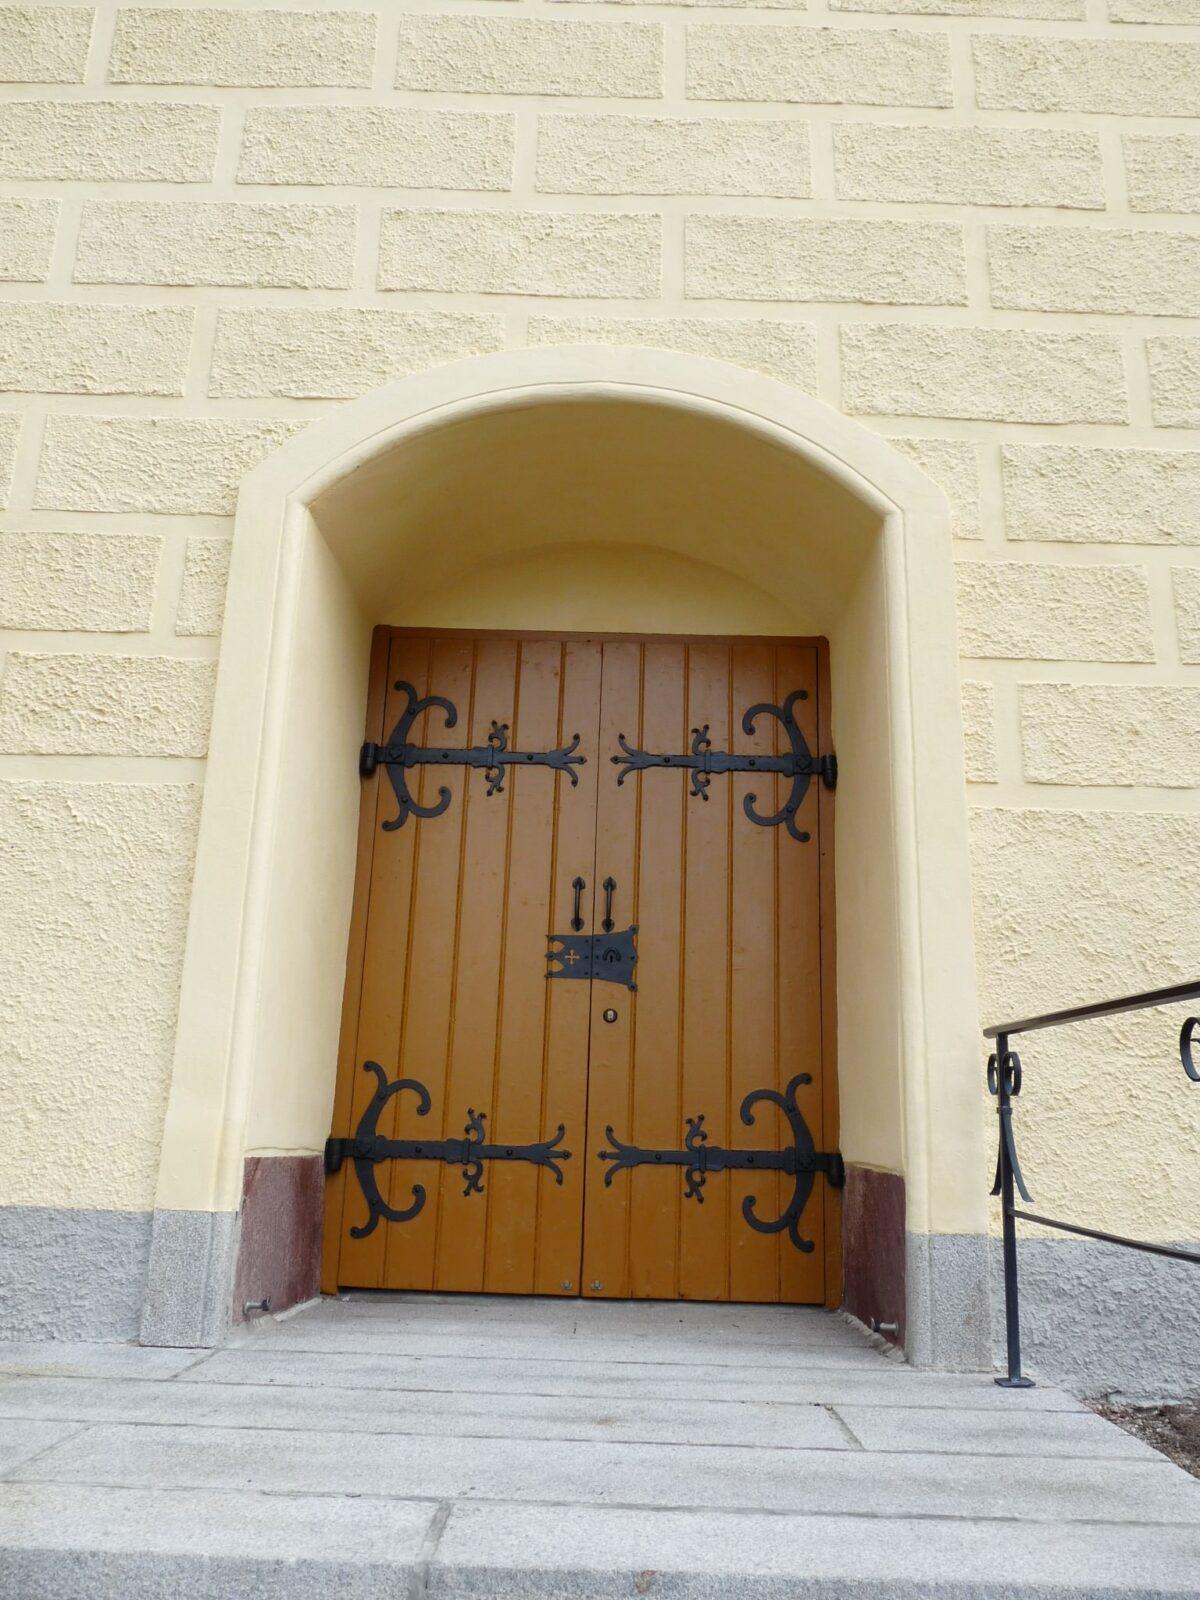 Turinge kyrka-P1030244-e1349803677599